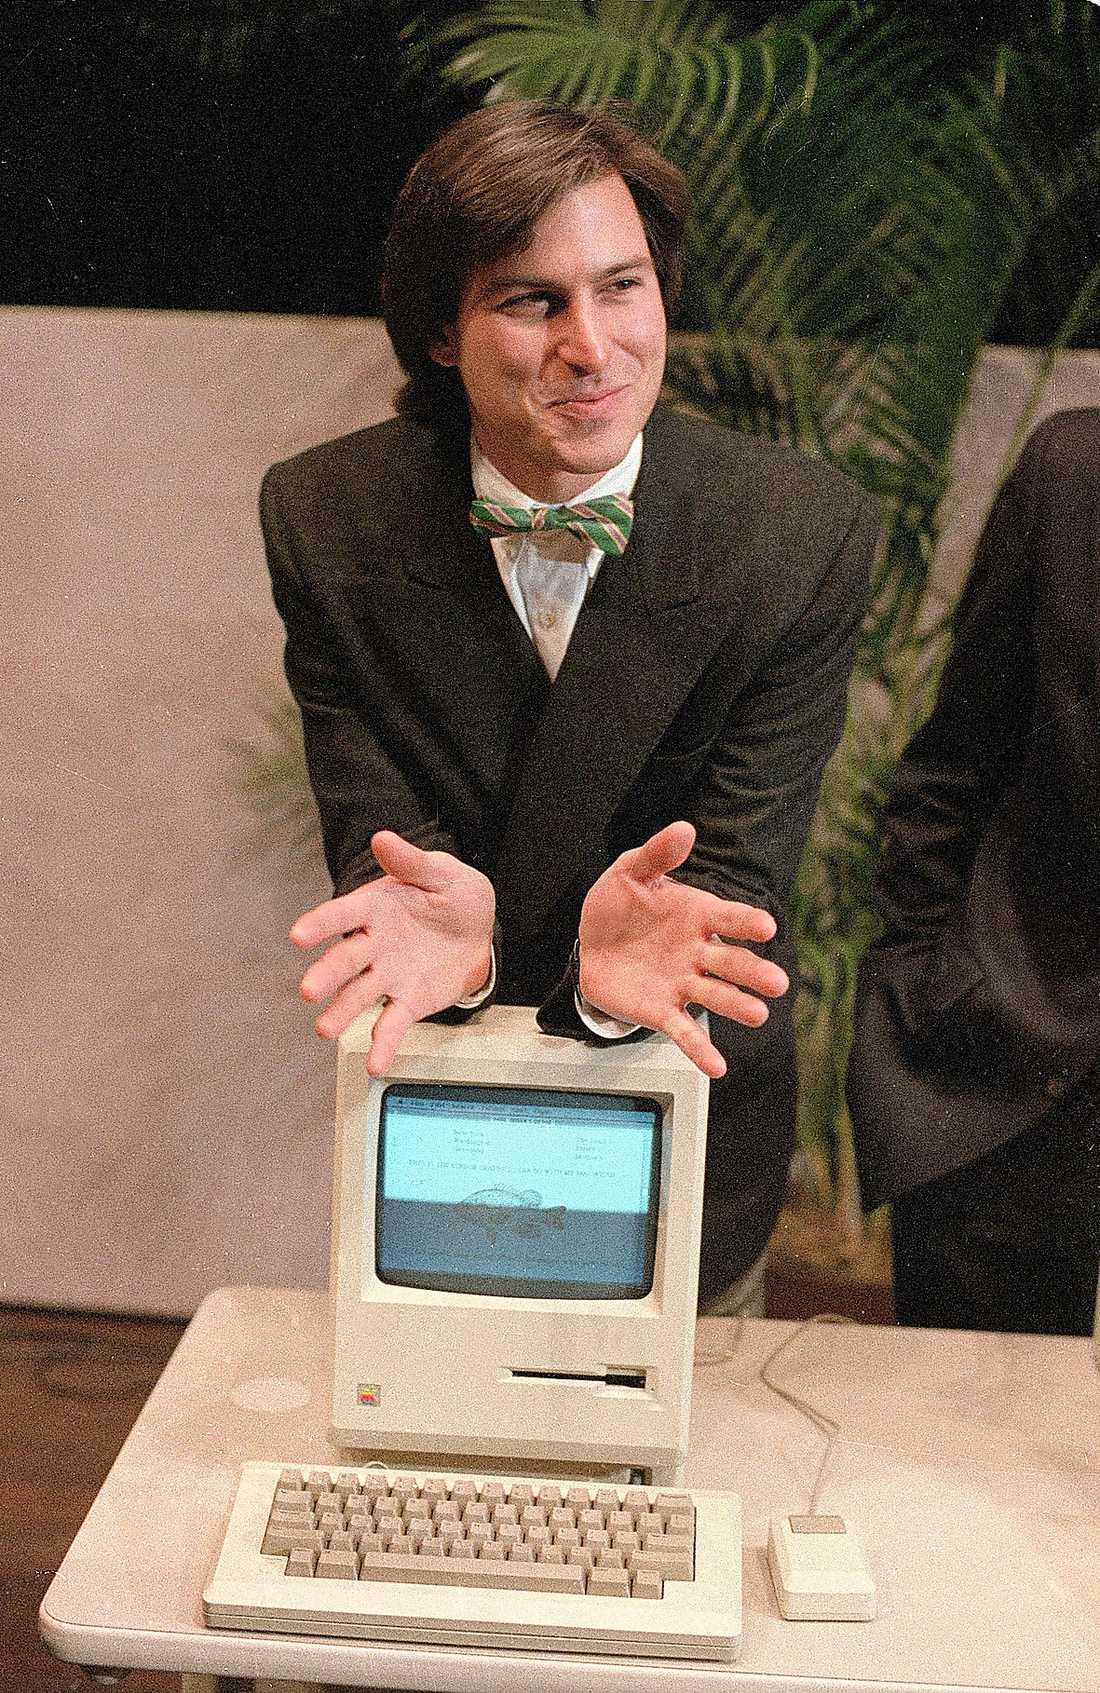 Macintosh 1984.